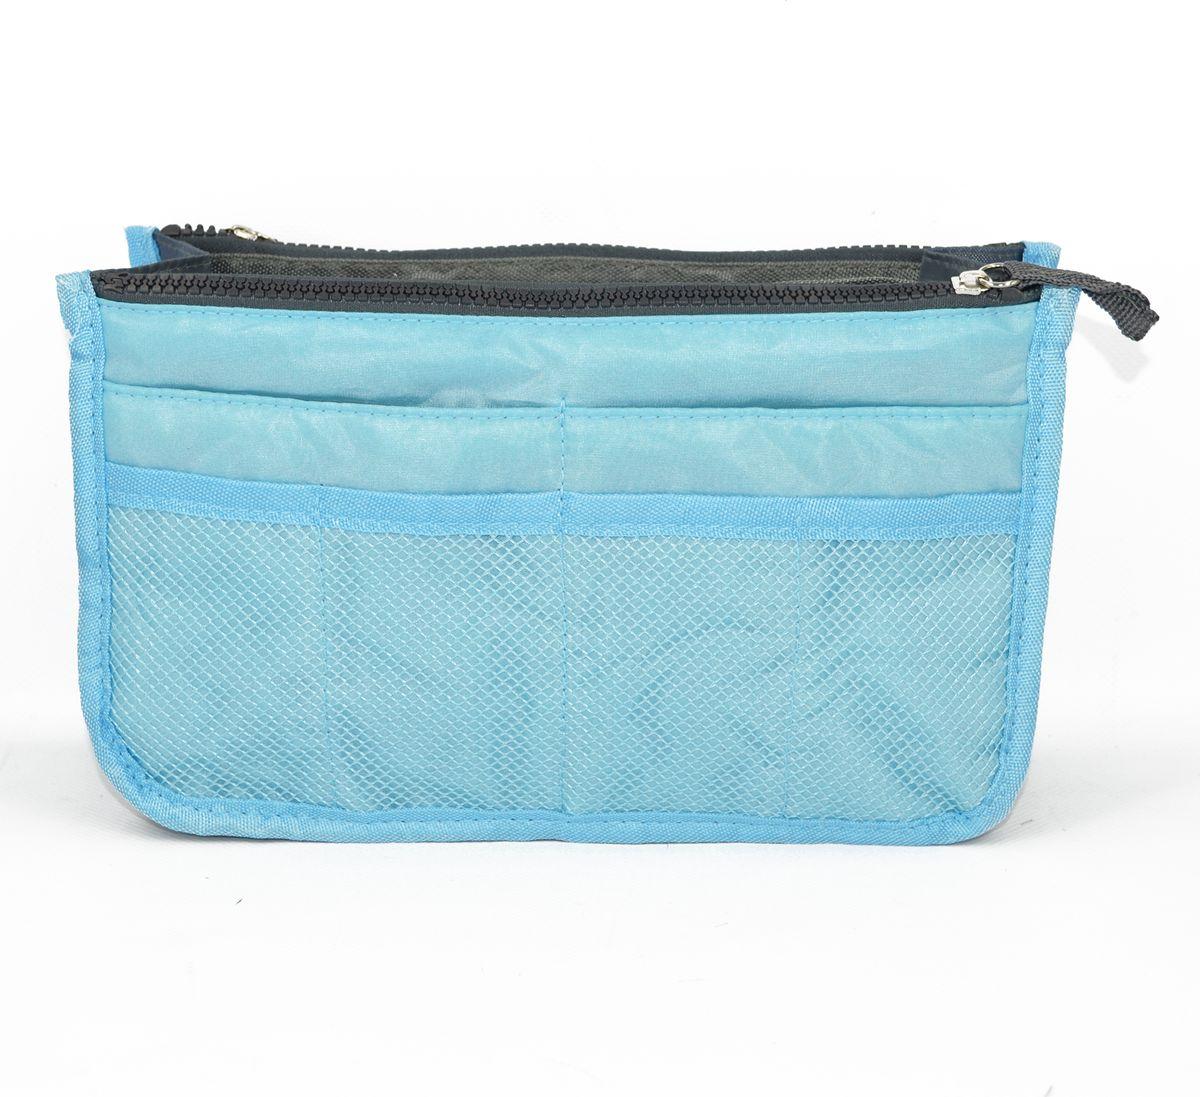 Органайзер-вкладыш для сумочки женский Kingth Goldn, цвет: голубой. УТ-00000348